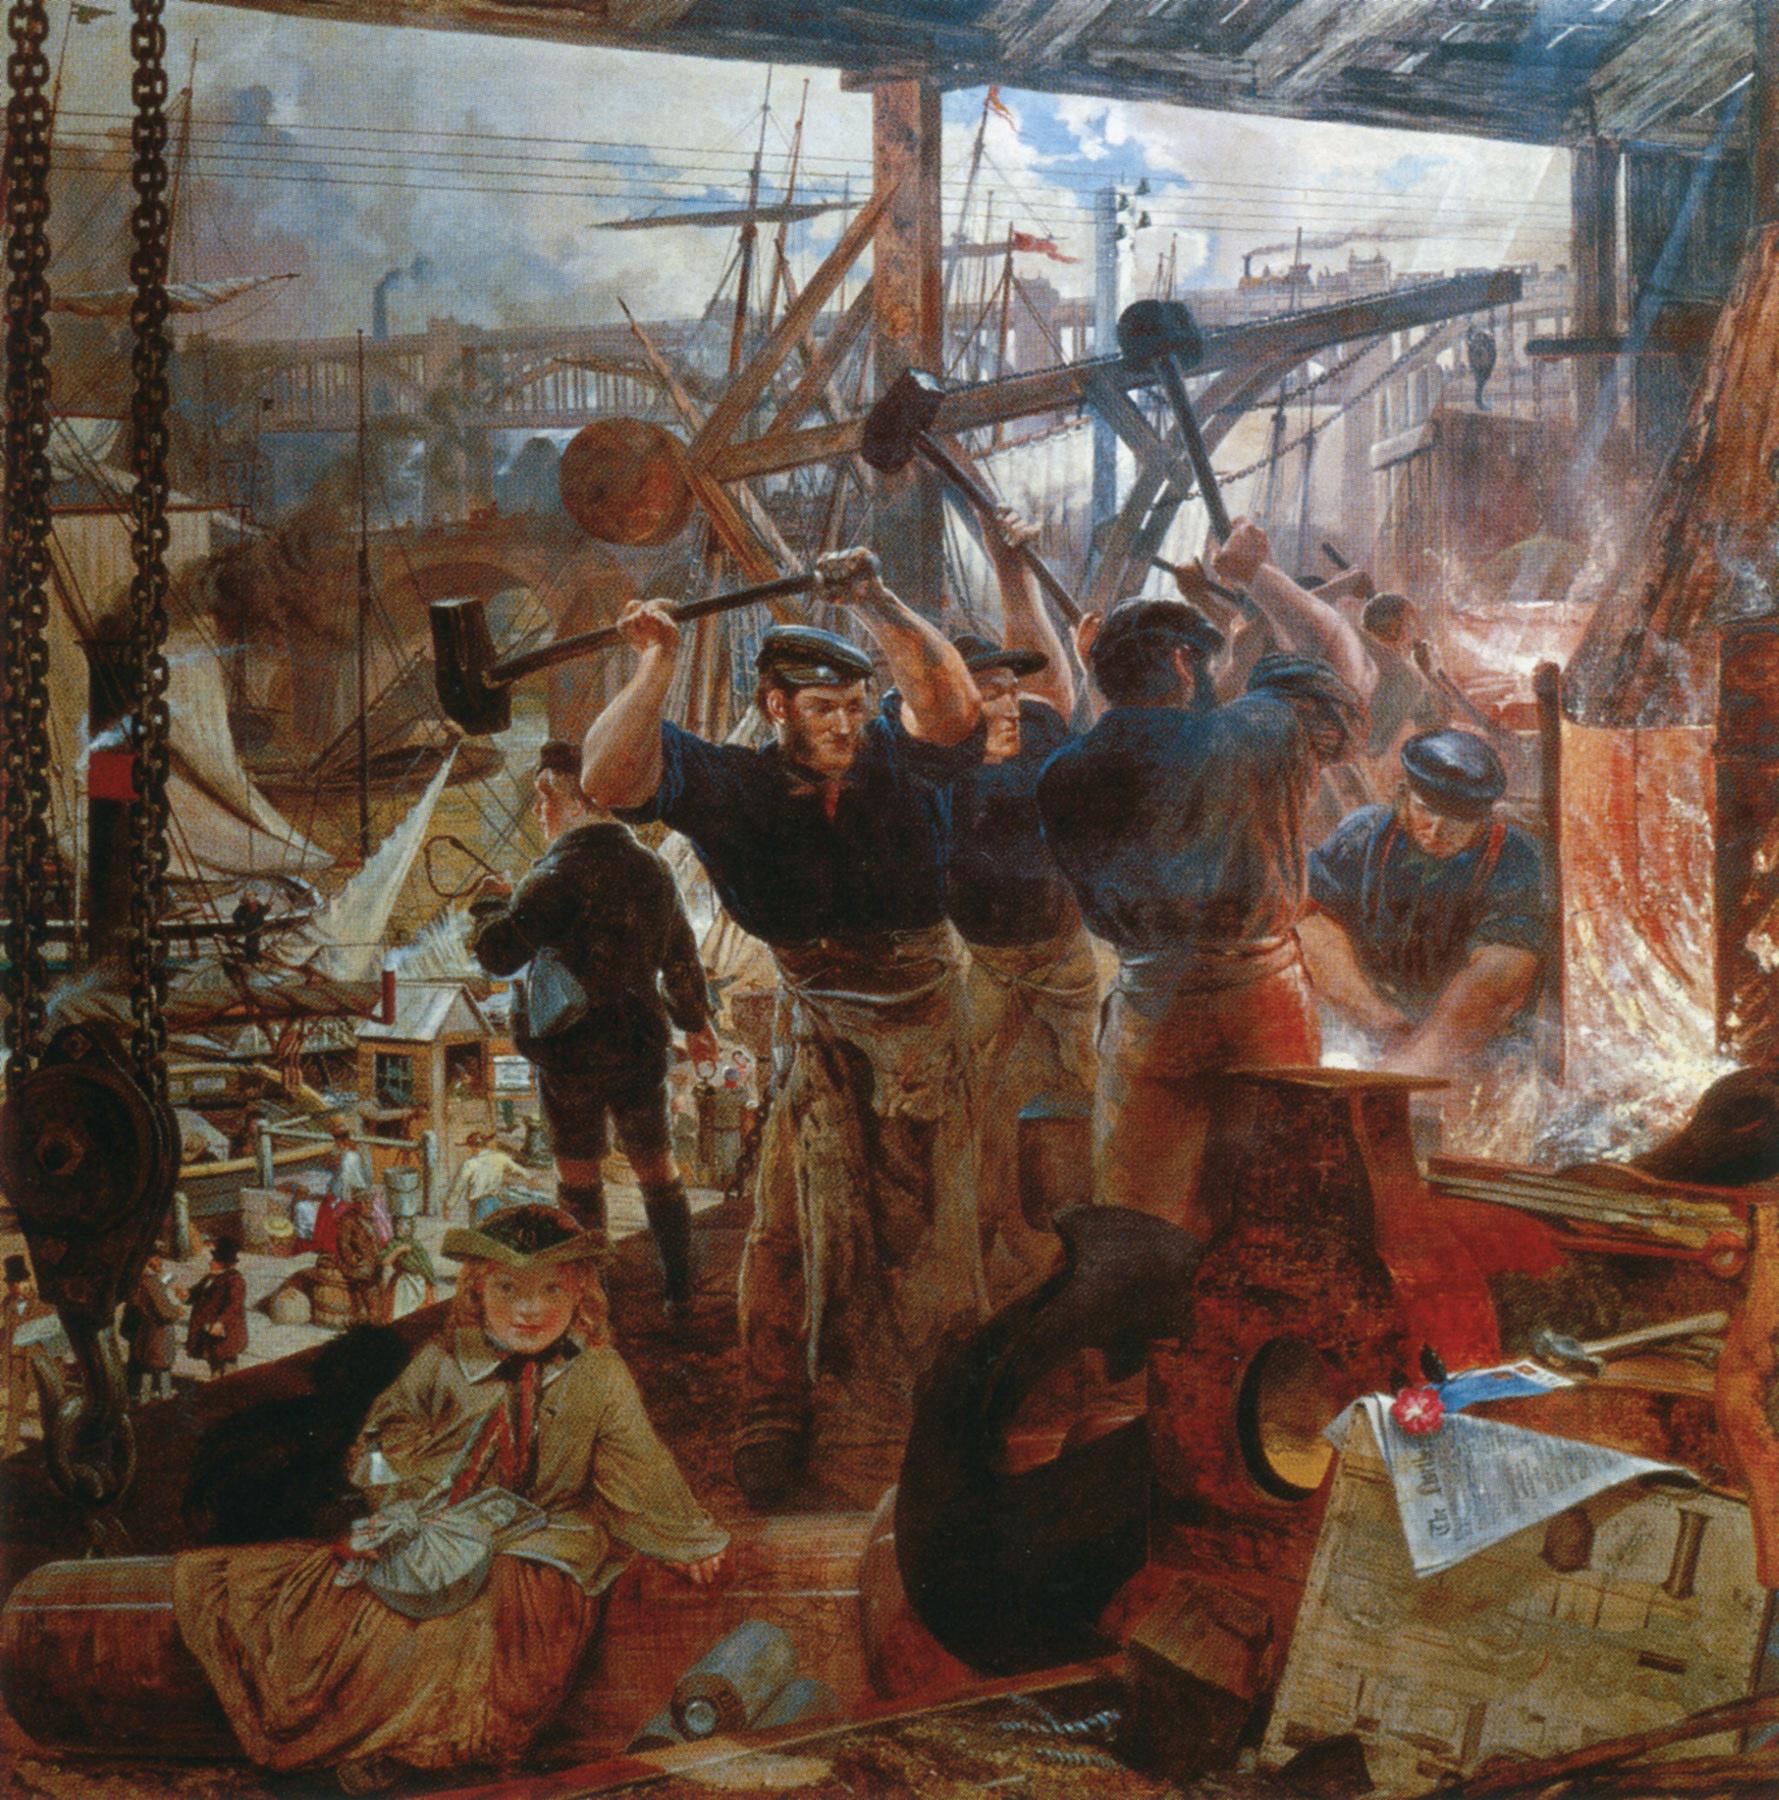 Iron and Coal (1855-60), painter William Bell Scott.